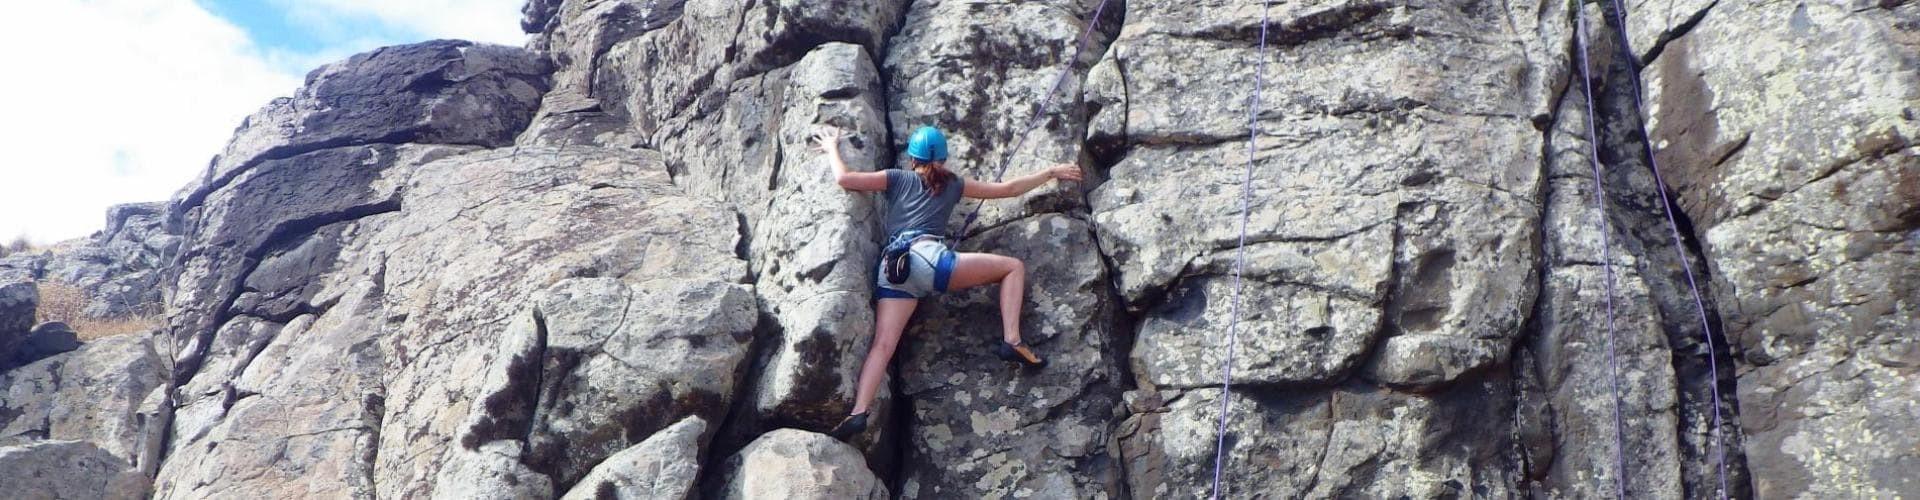 Climbing in Madeira Island